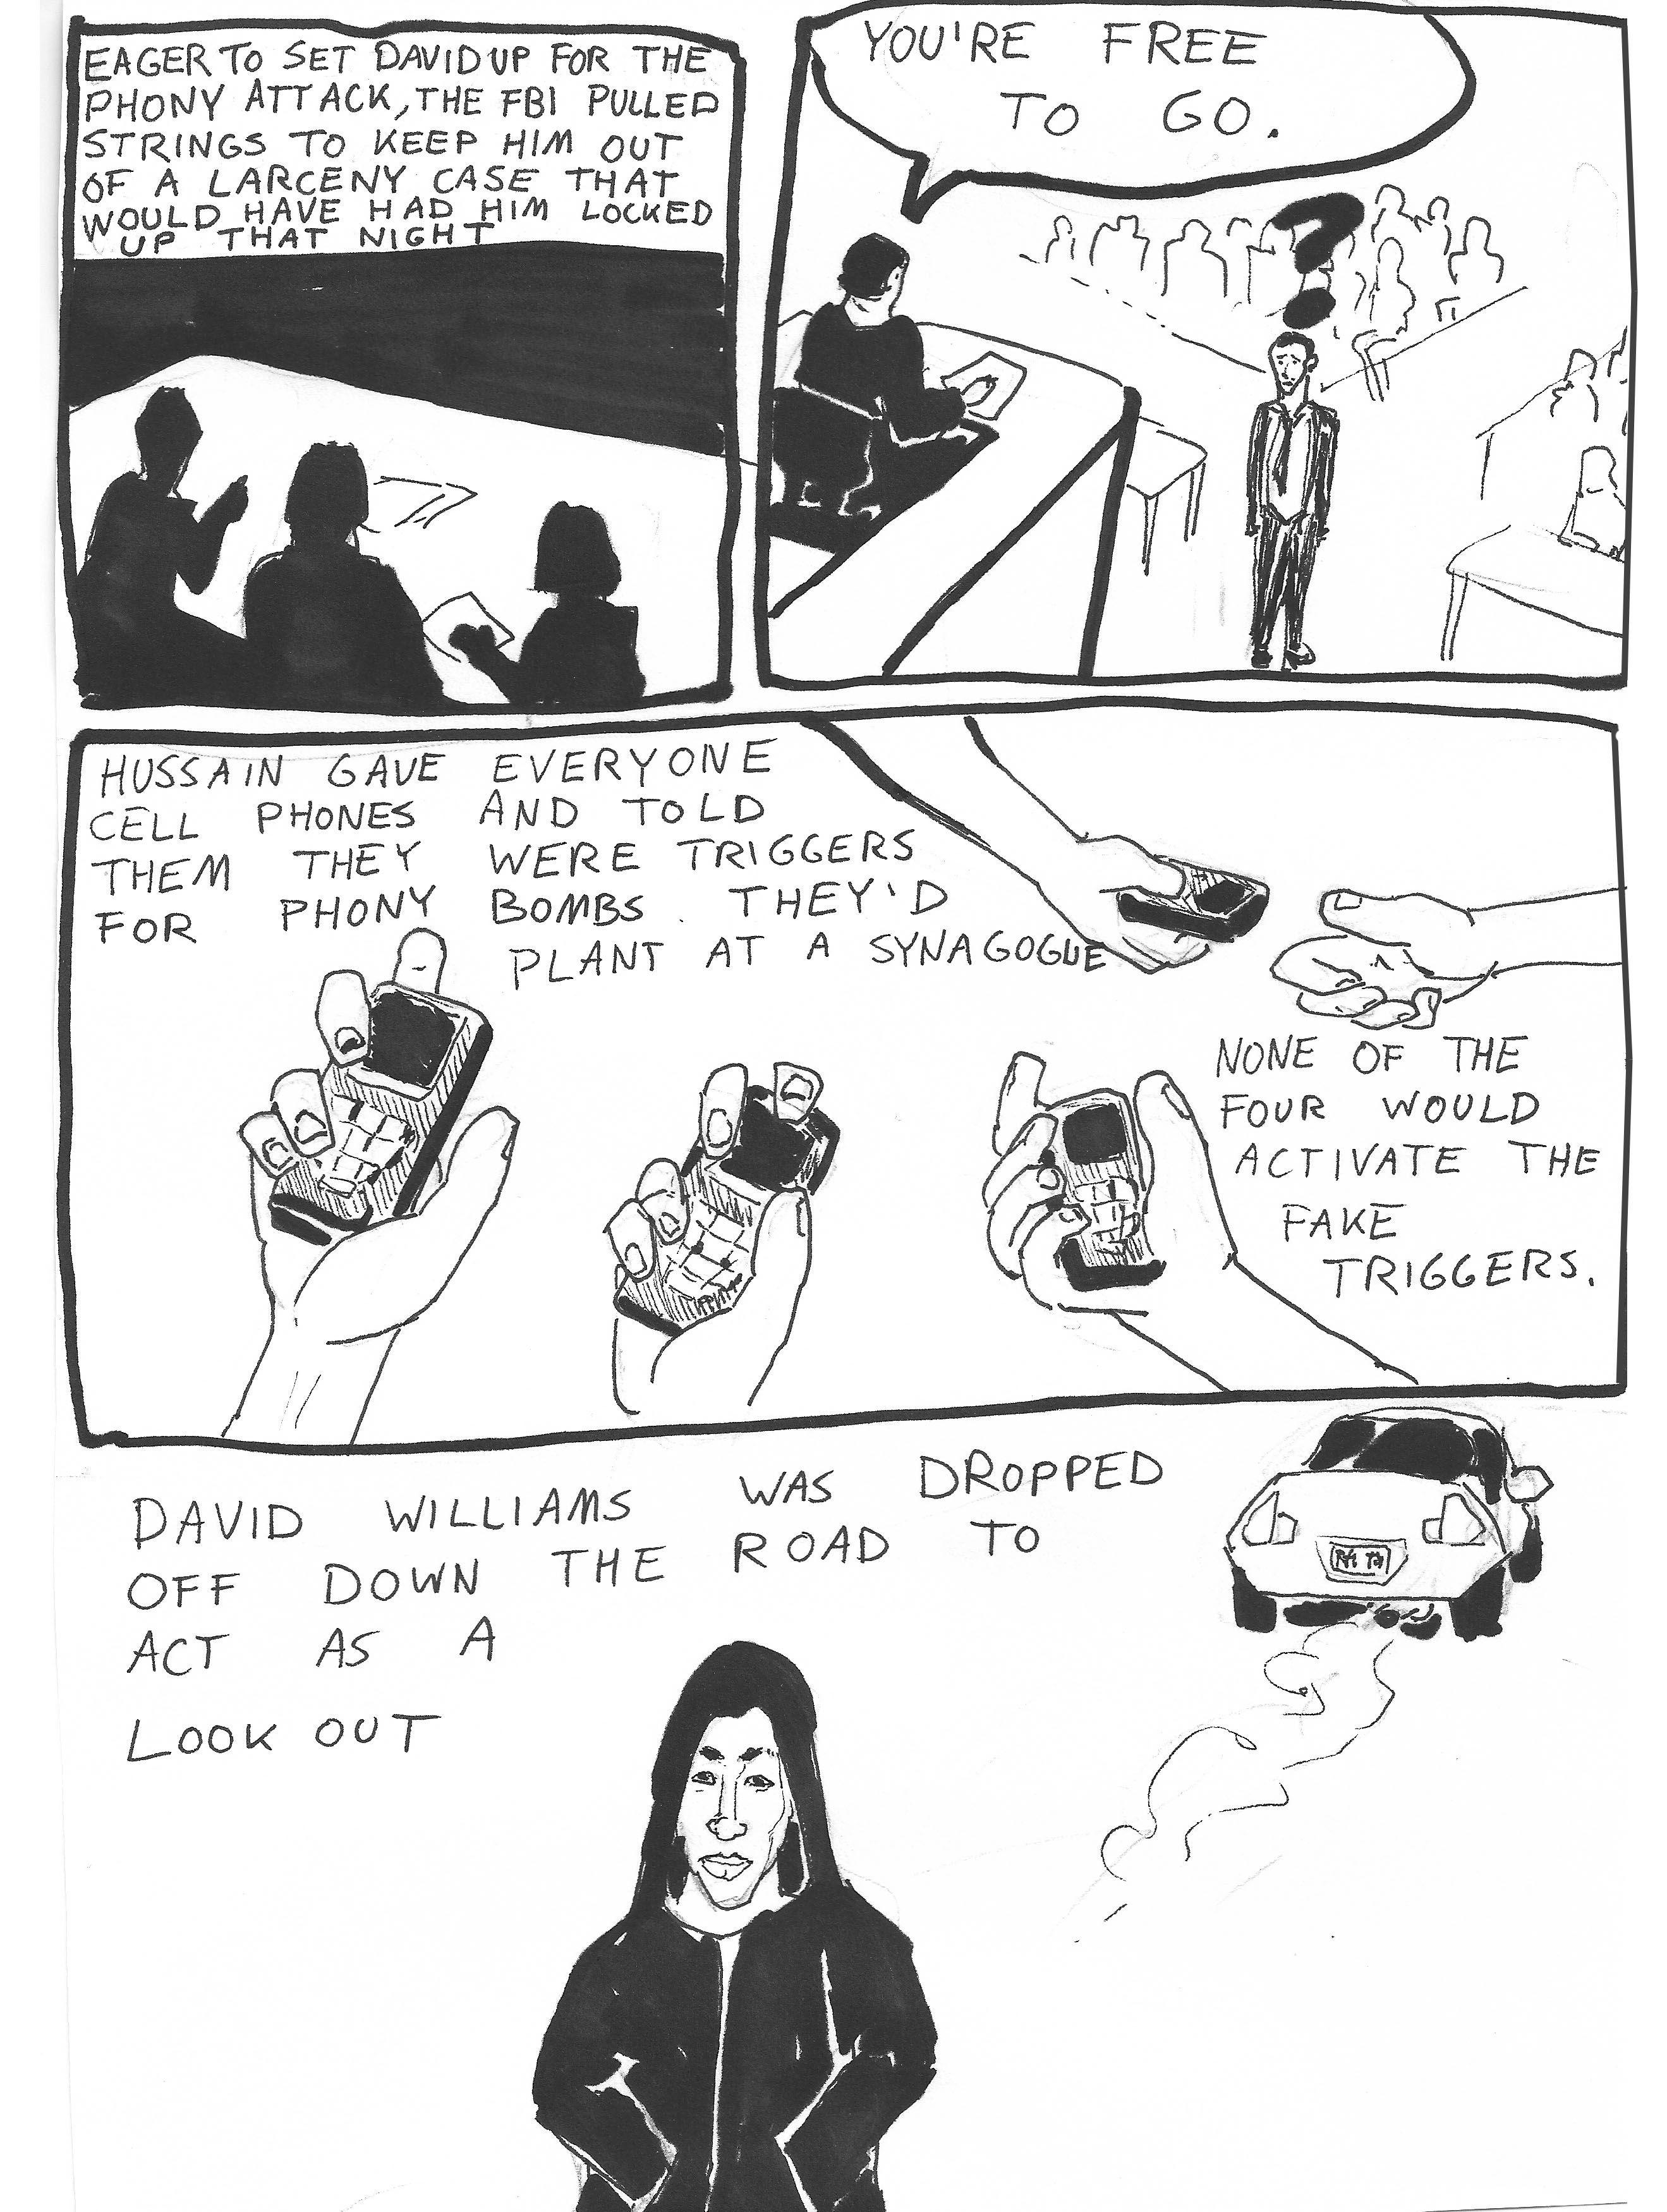 The Tragic Story of the Newburgh 4. pg.7